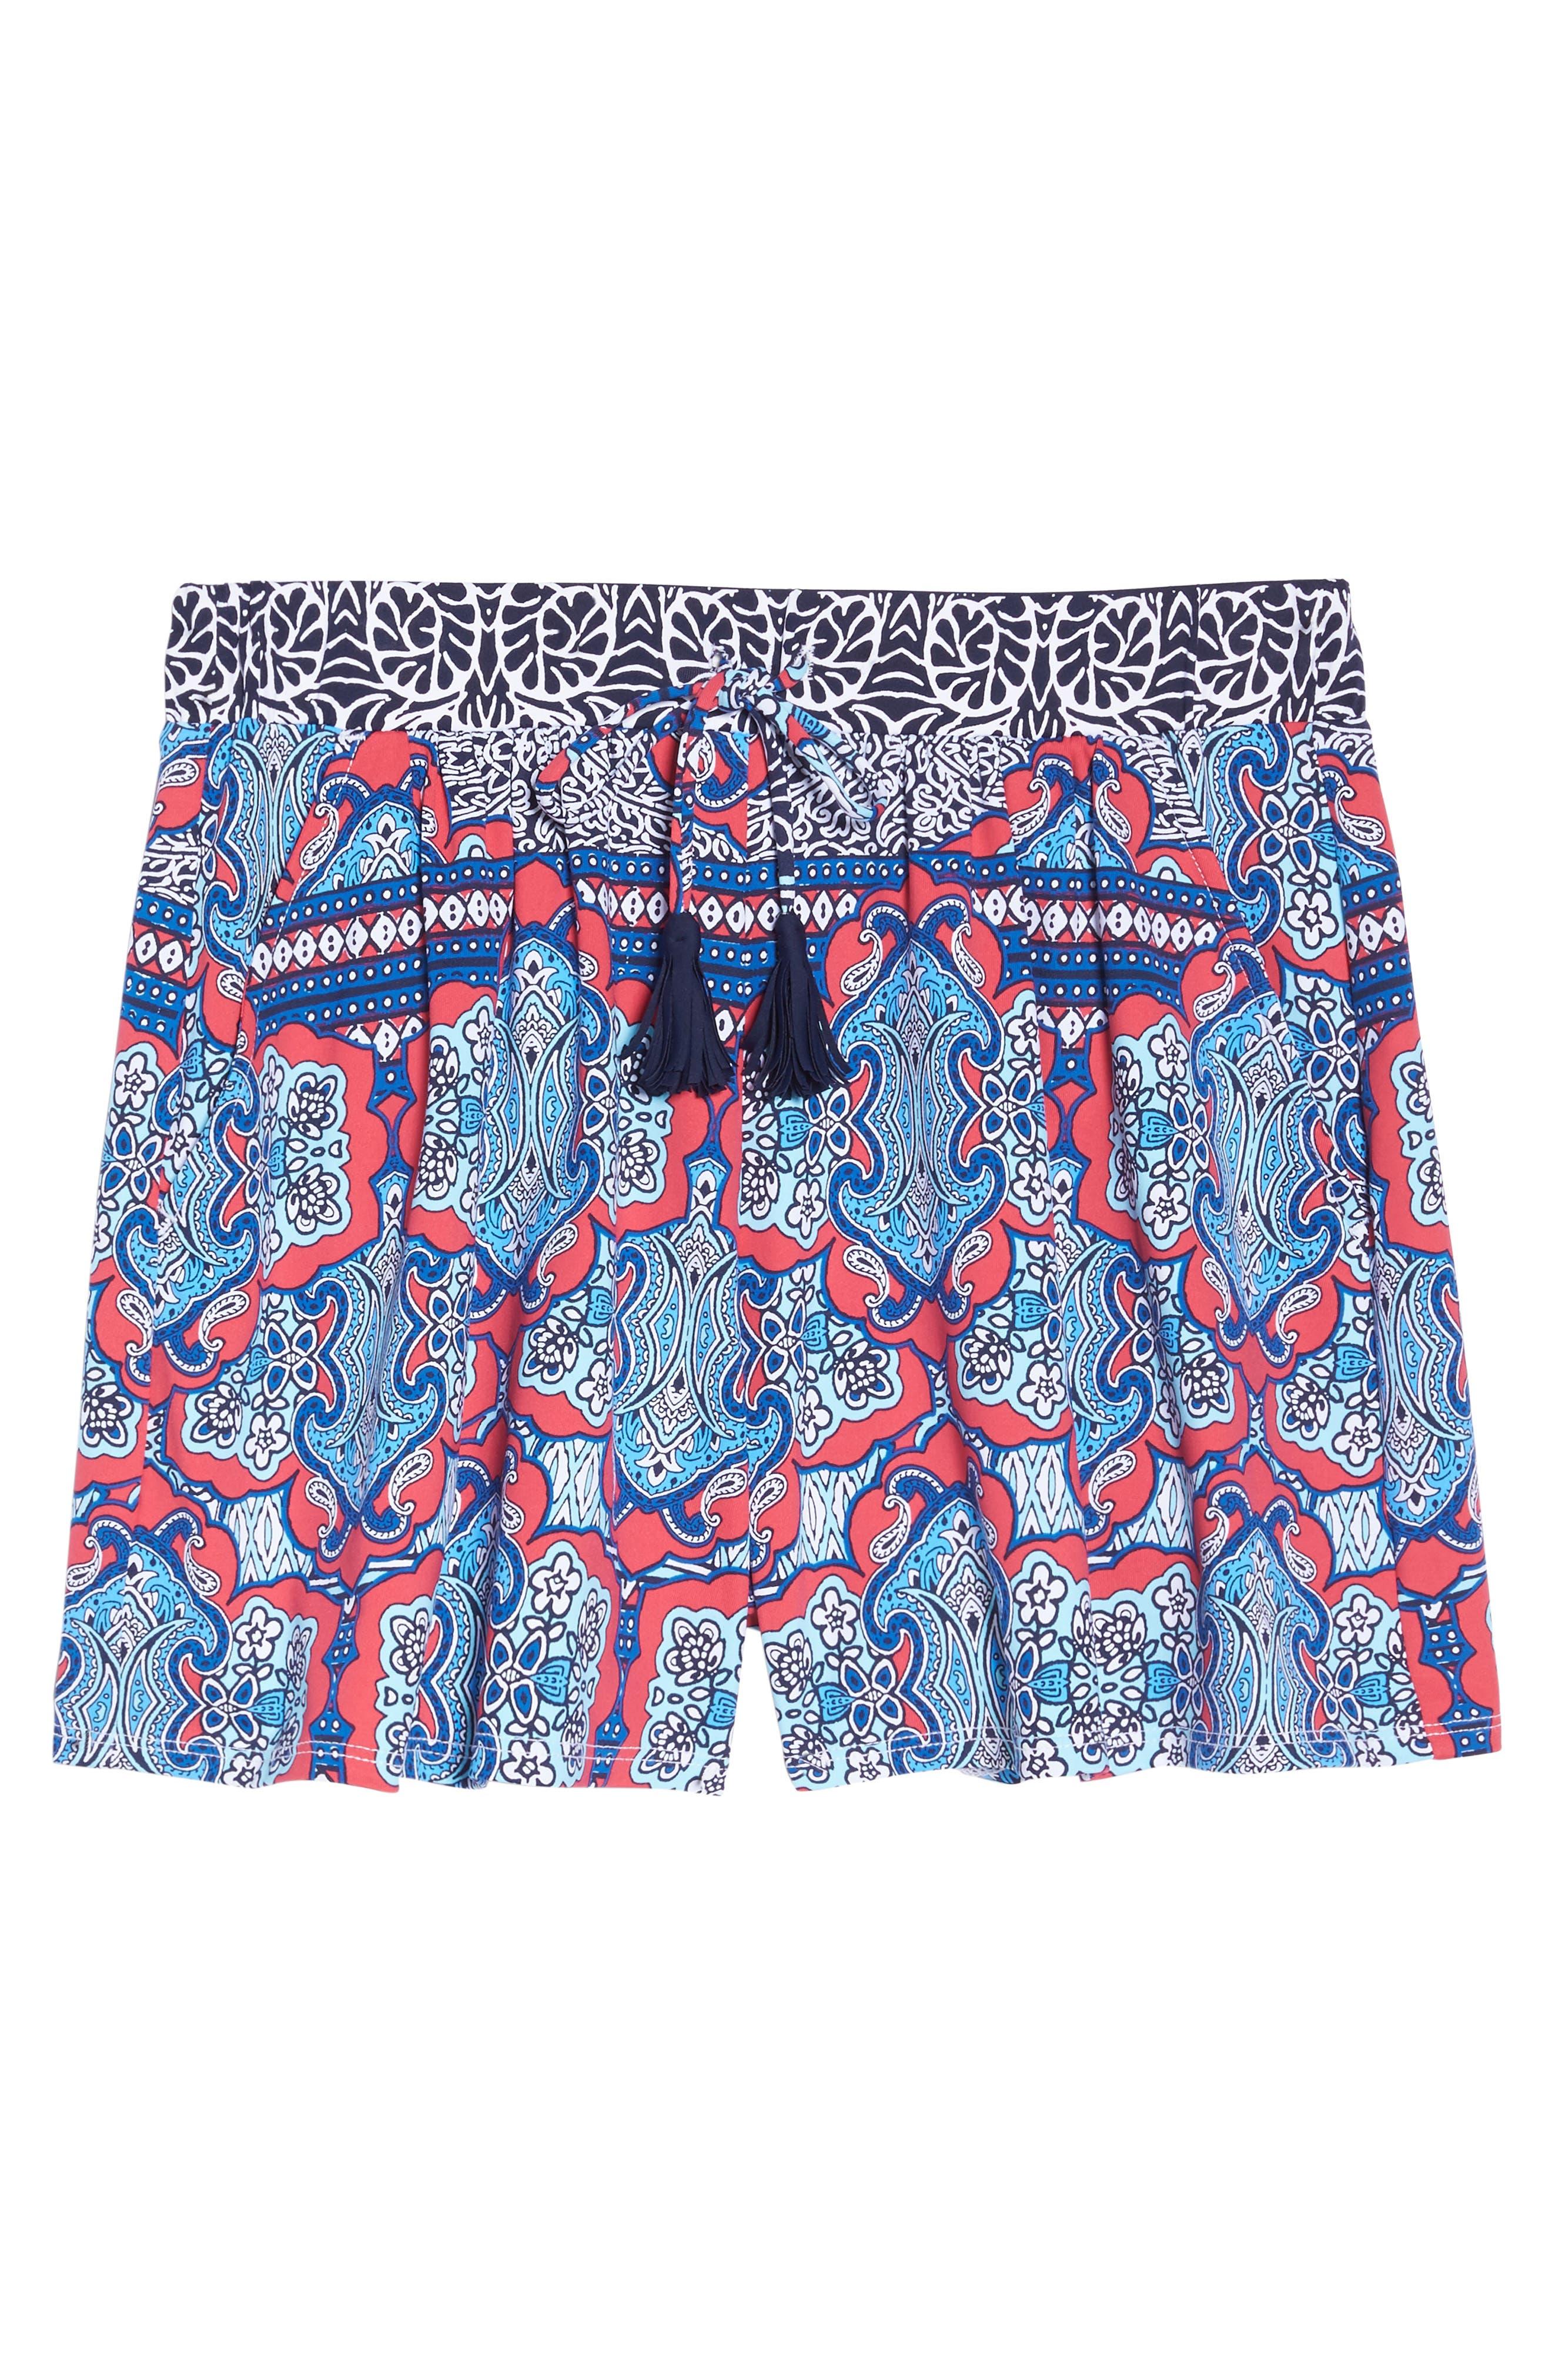 Riviera Tiles Cover-Up Shorts,                             Alternate thumbnail 6, color,                             CERISE